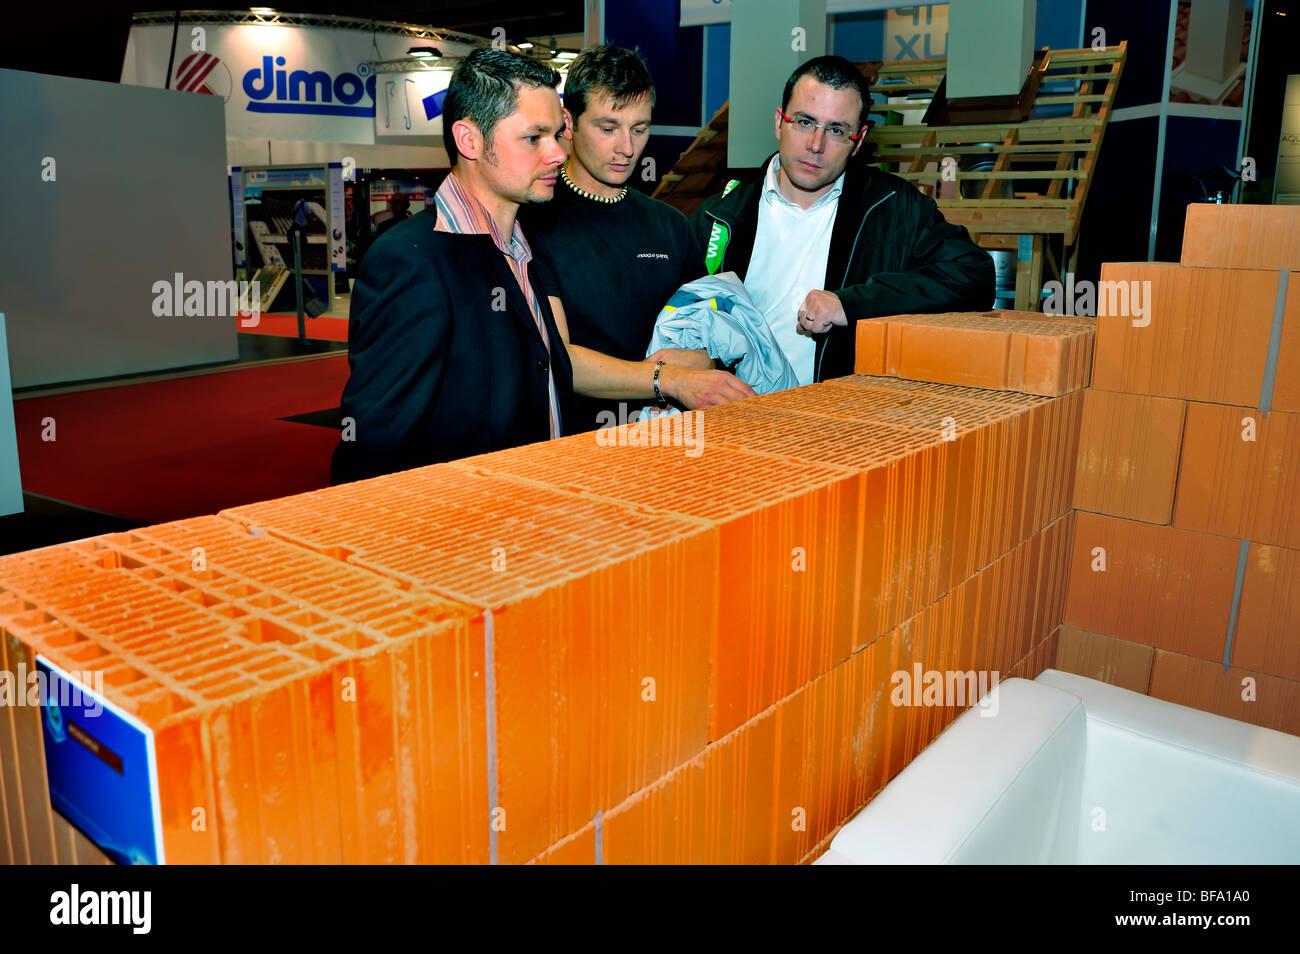 Paris, France, Business Meeting, Construction Equipment Trade Show,  Batimat, Insulated Building Bricks Display, - Stock Image